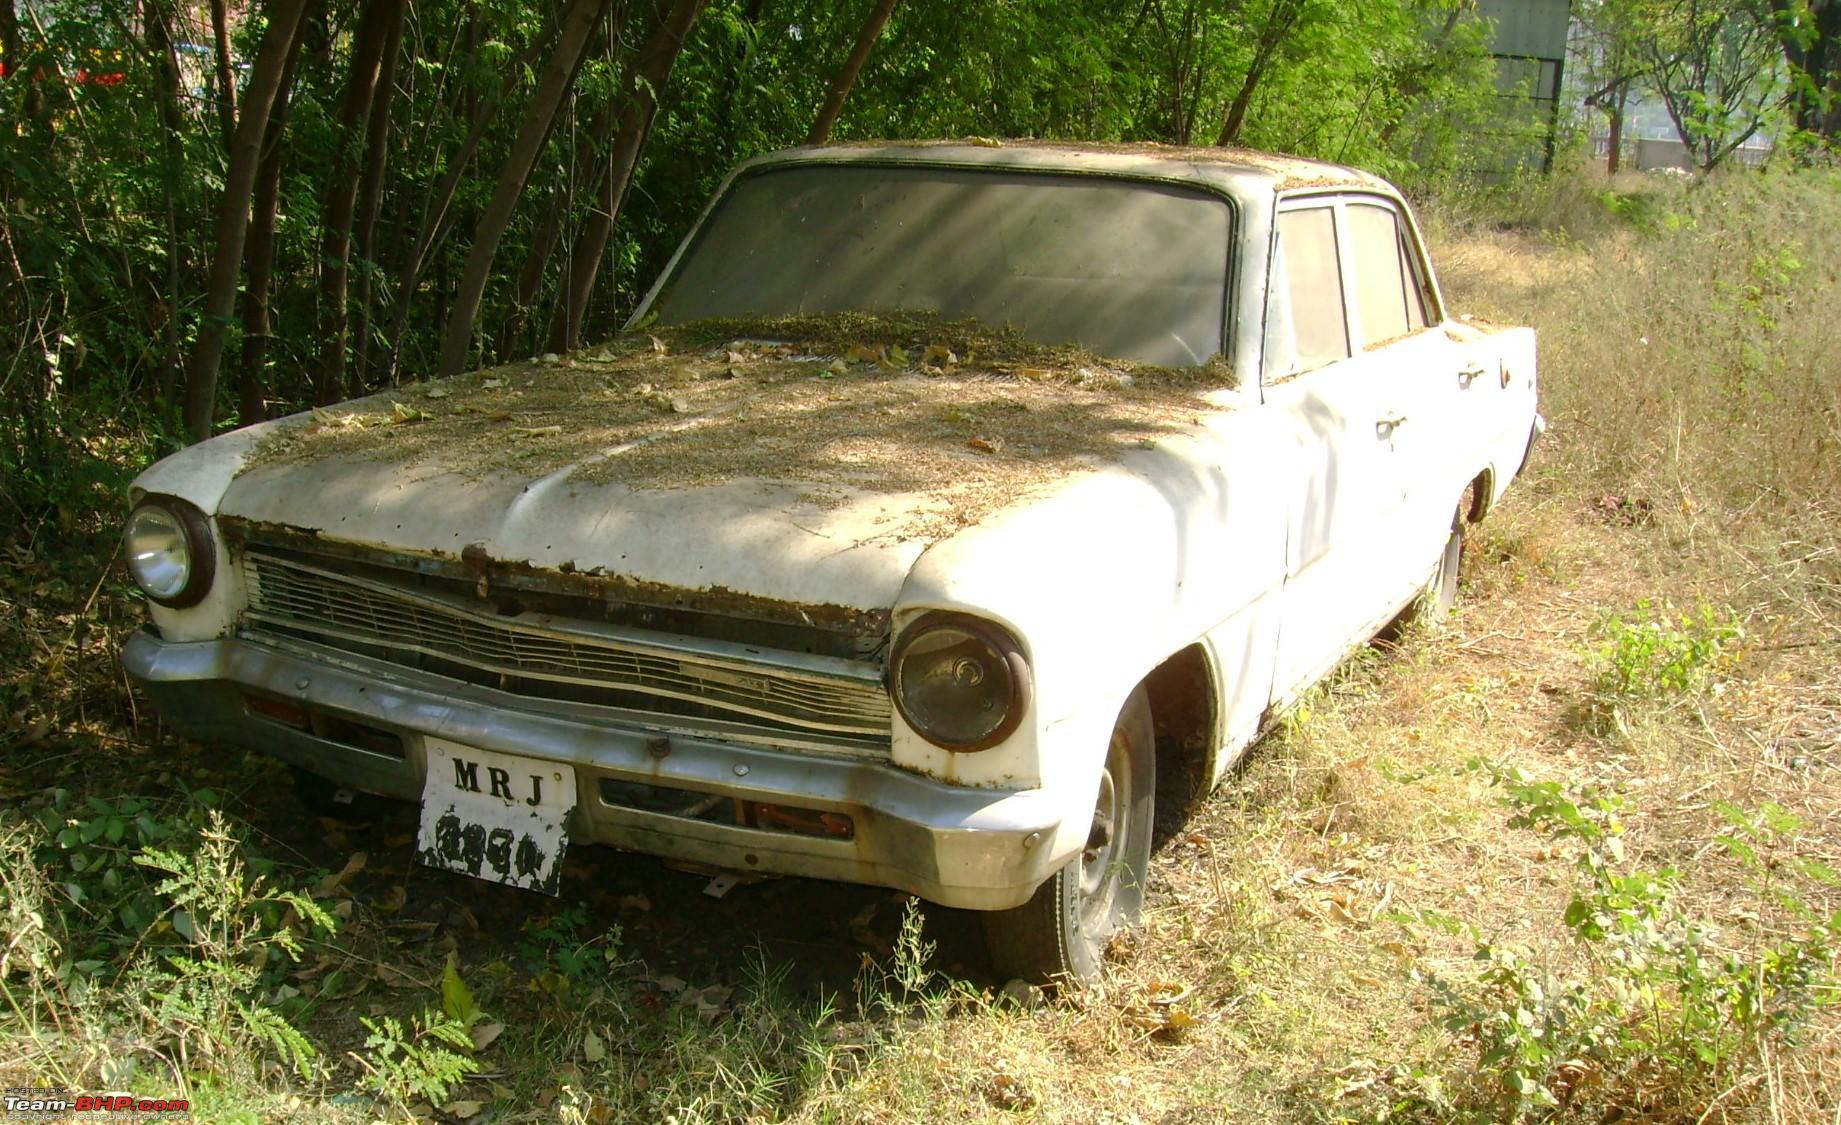 1966 Chevrolet Nova restoration - Finally found a classic! - Page ...